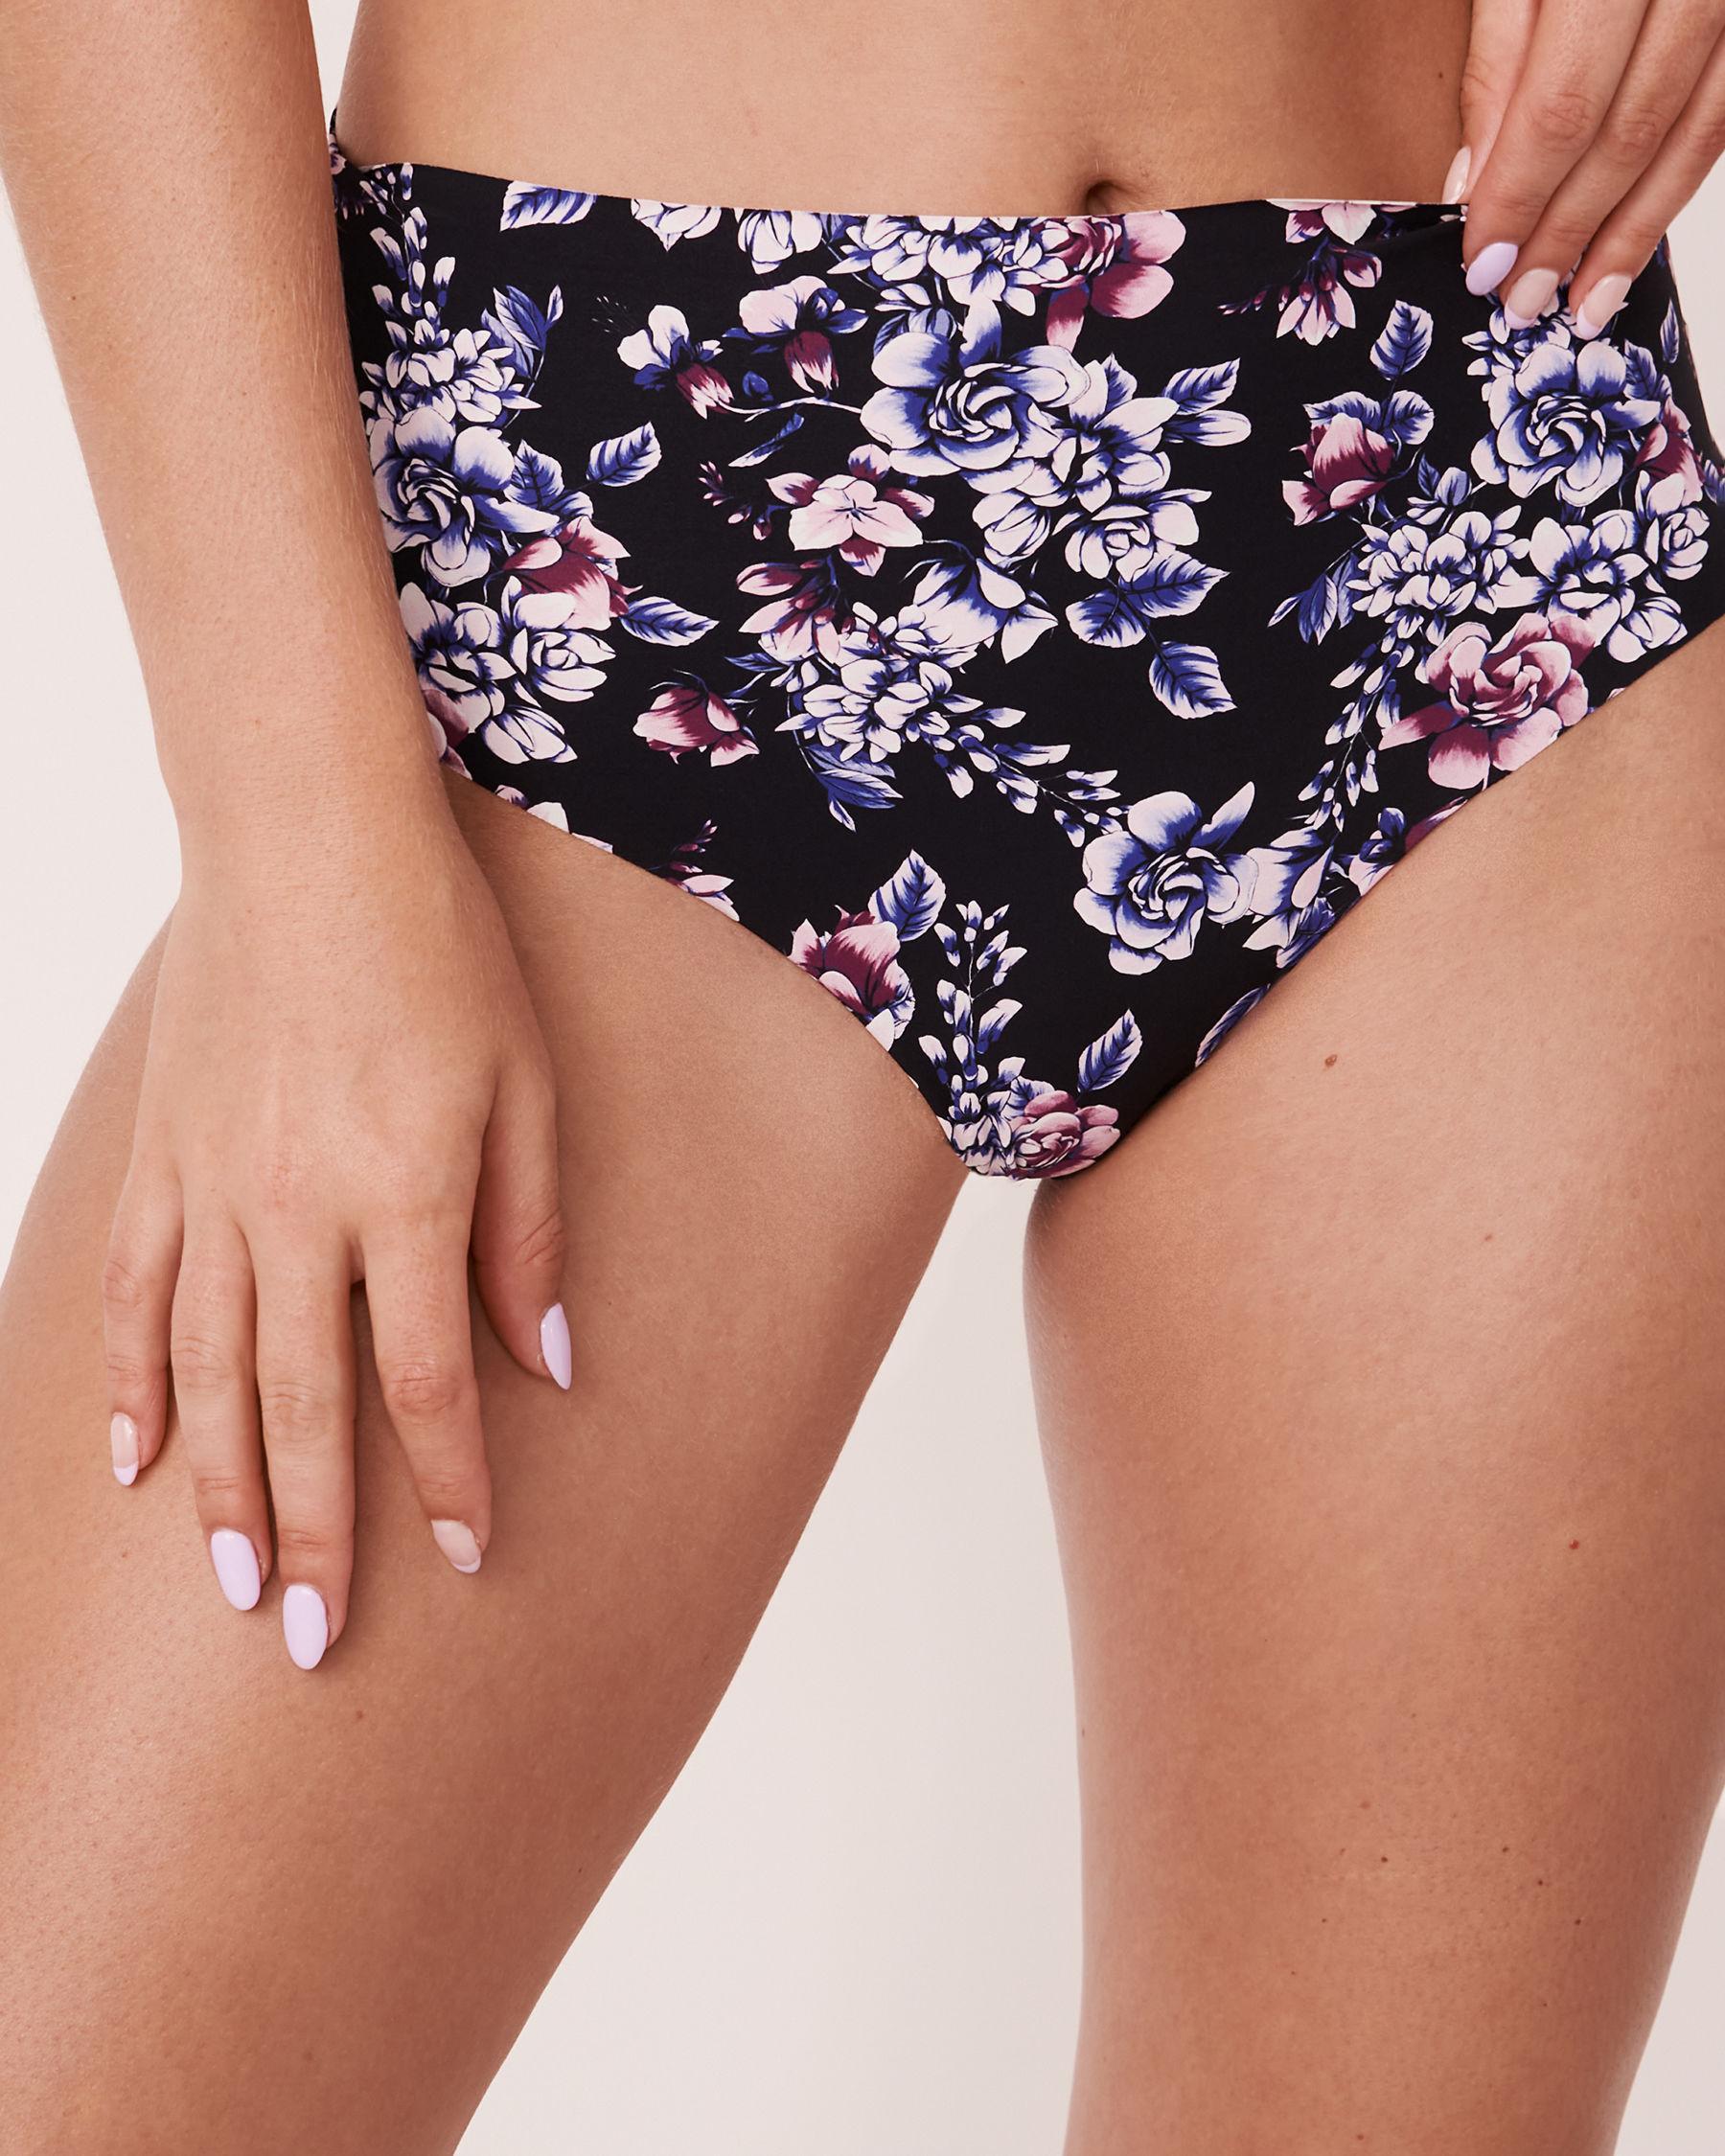 LA VIE EN ROSE Seamless High Waist Thong Panty Watercolor florals 20200083 - View1